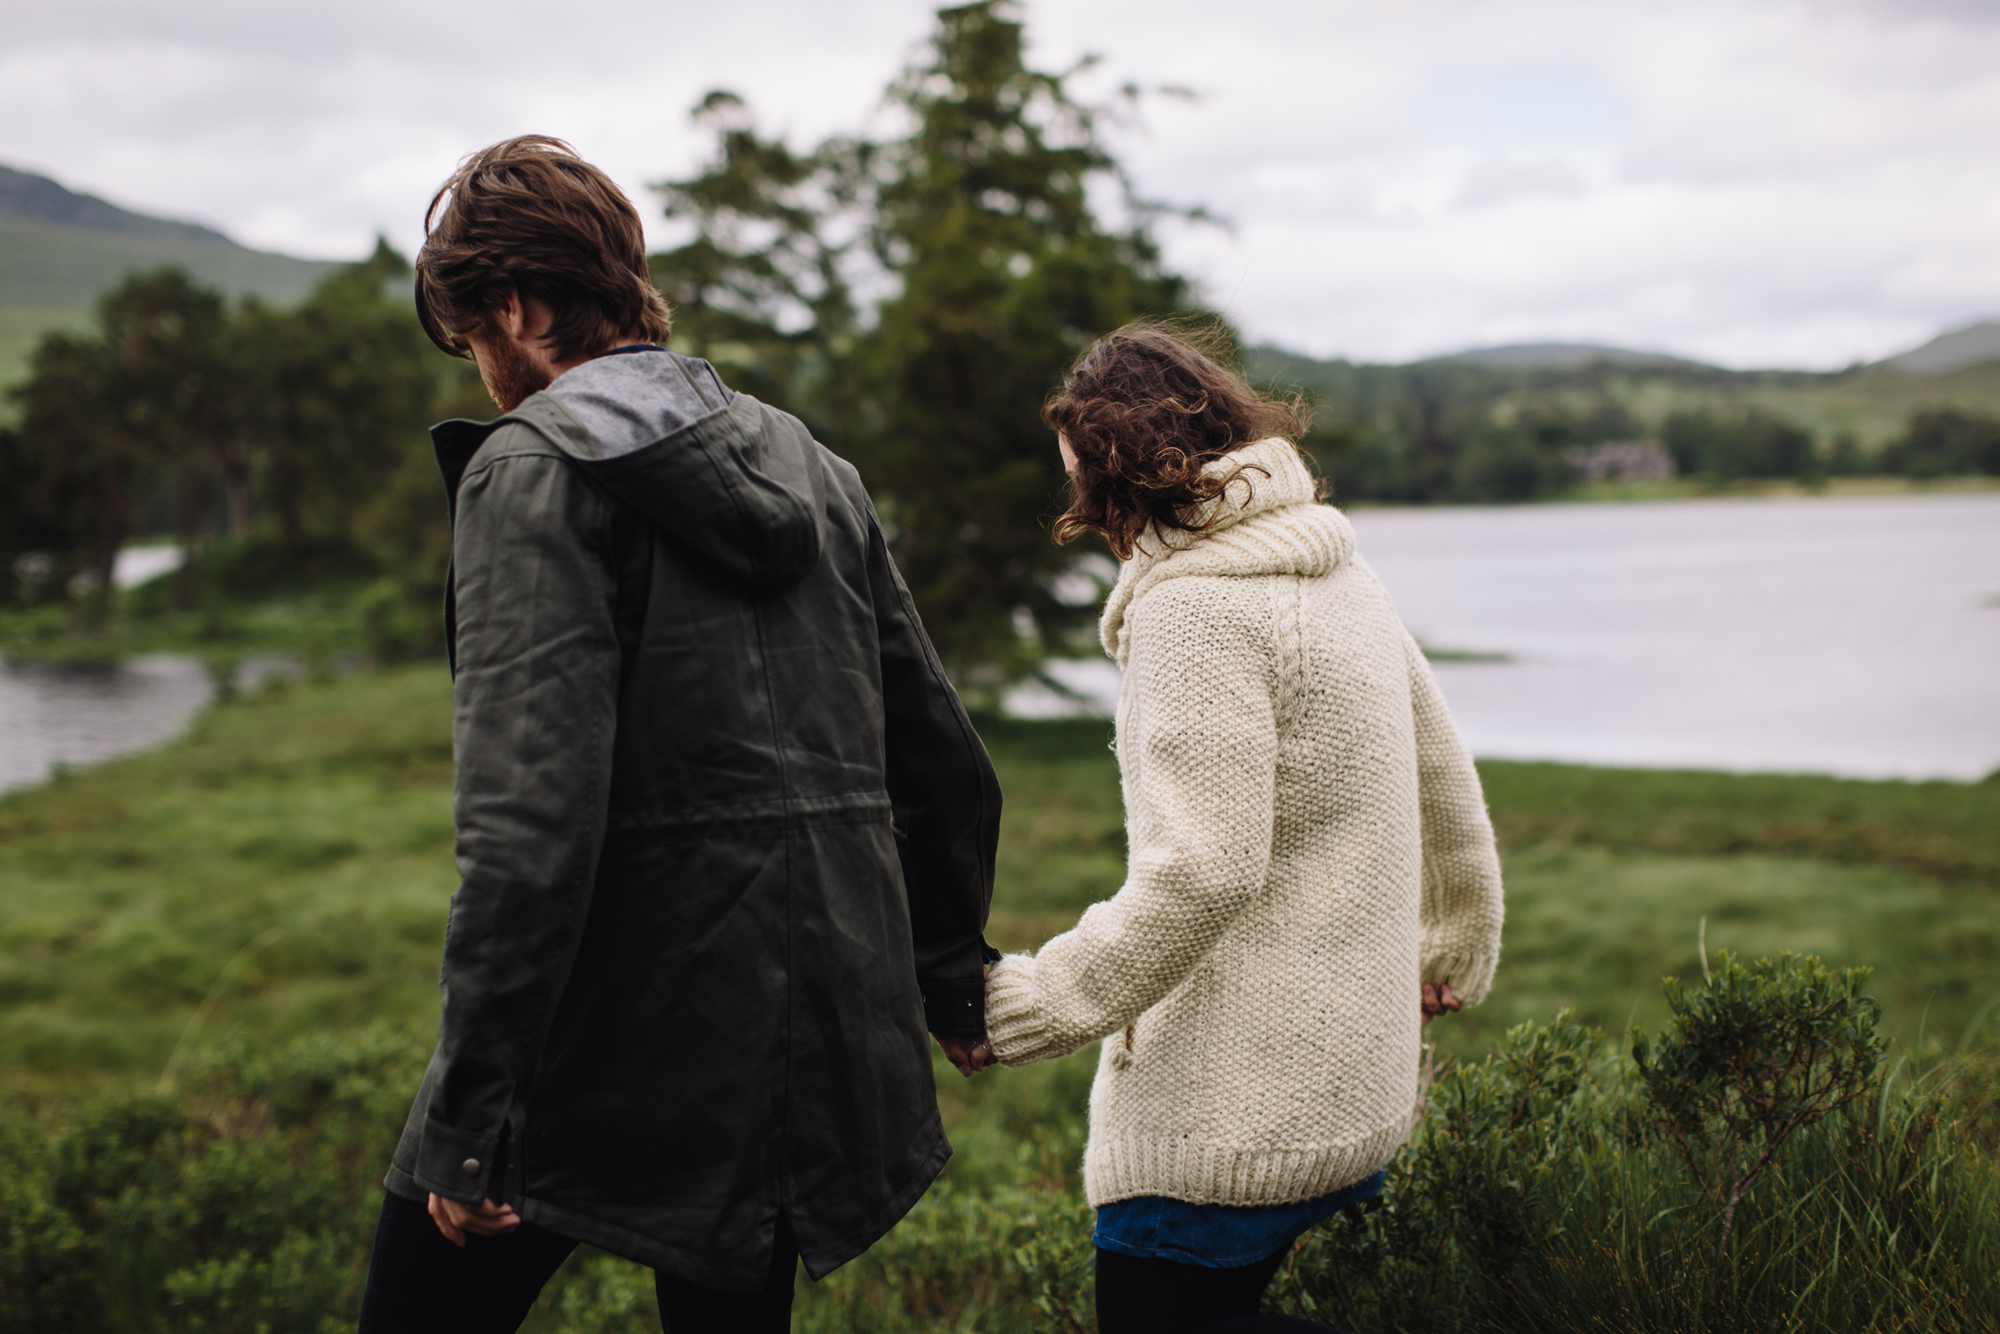 couple photoshoot in Glencoe, Scotland, scottish wedding photographer, creative and romantic portraits